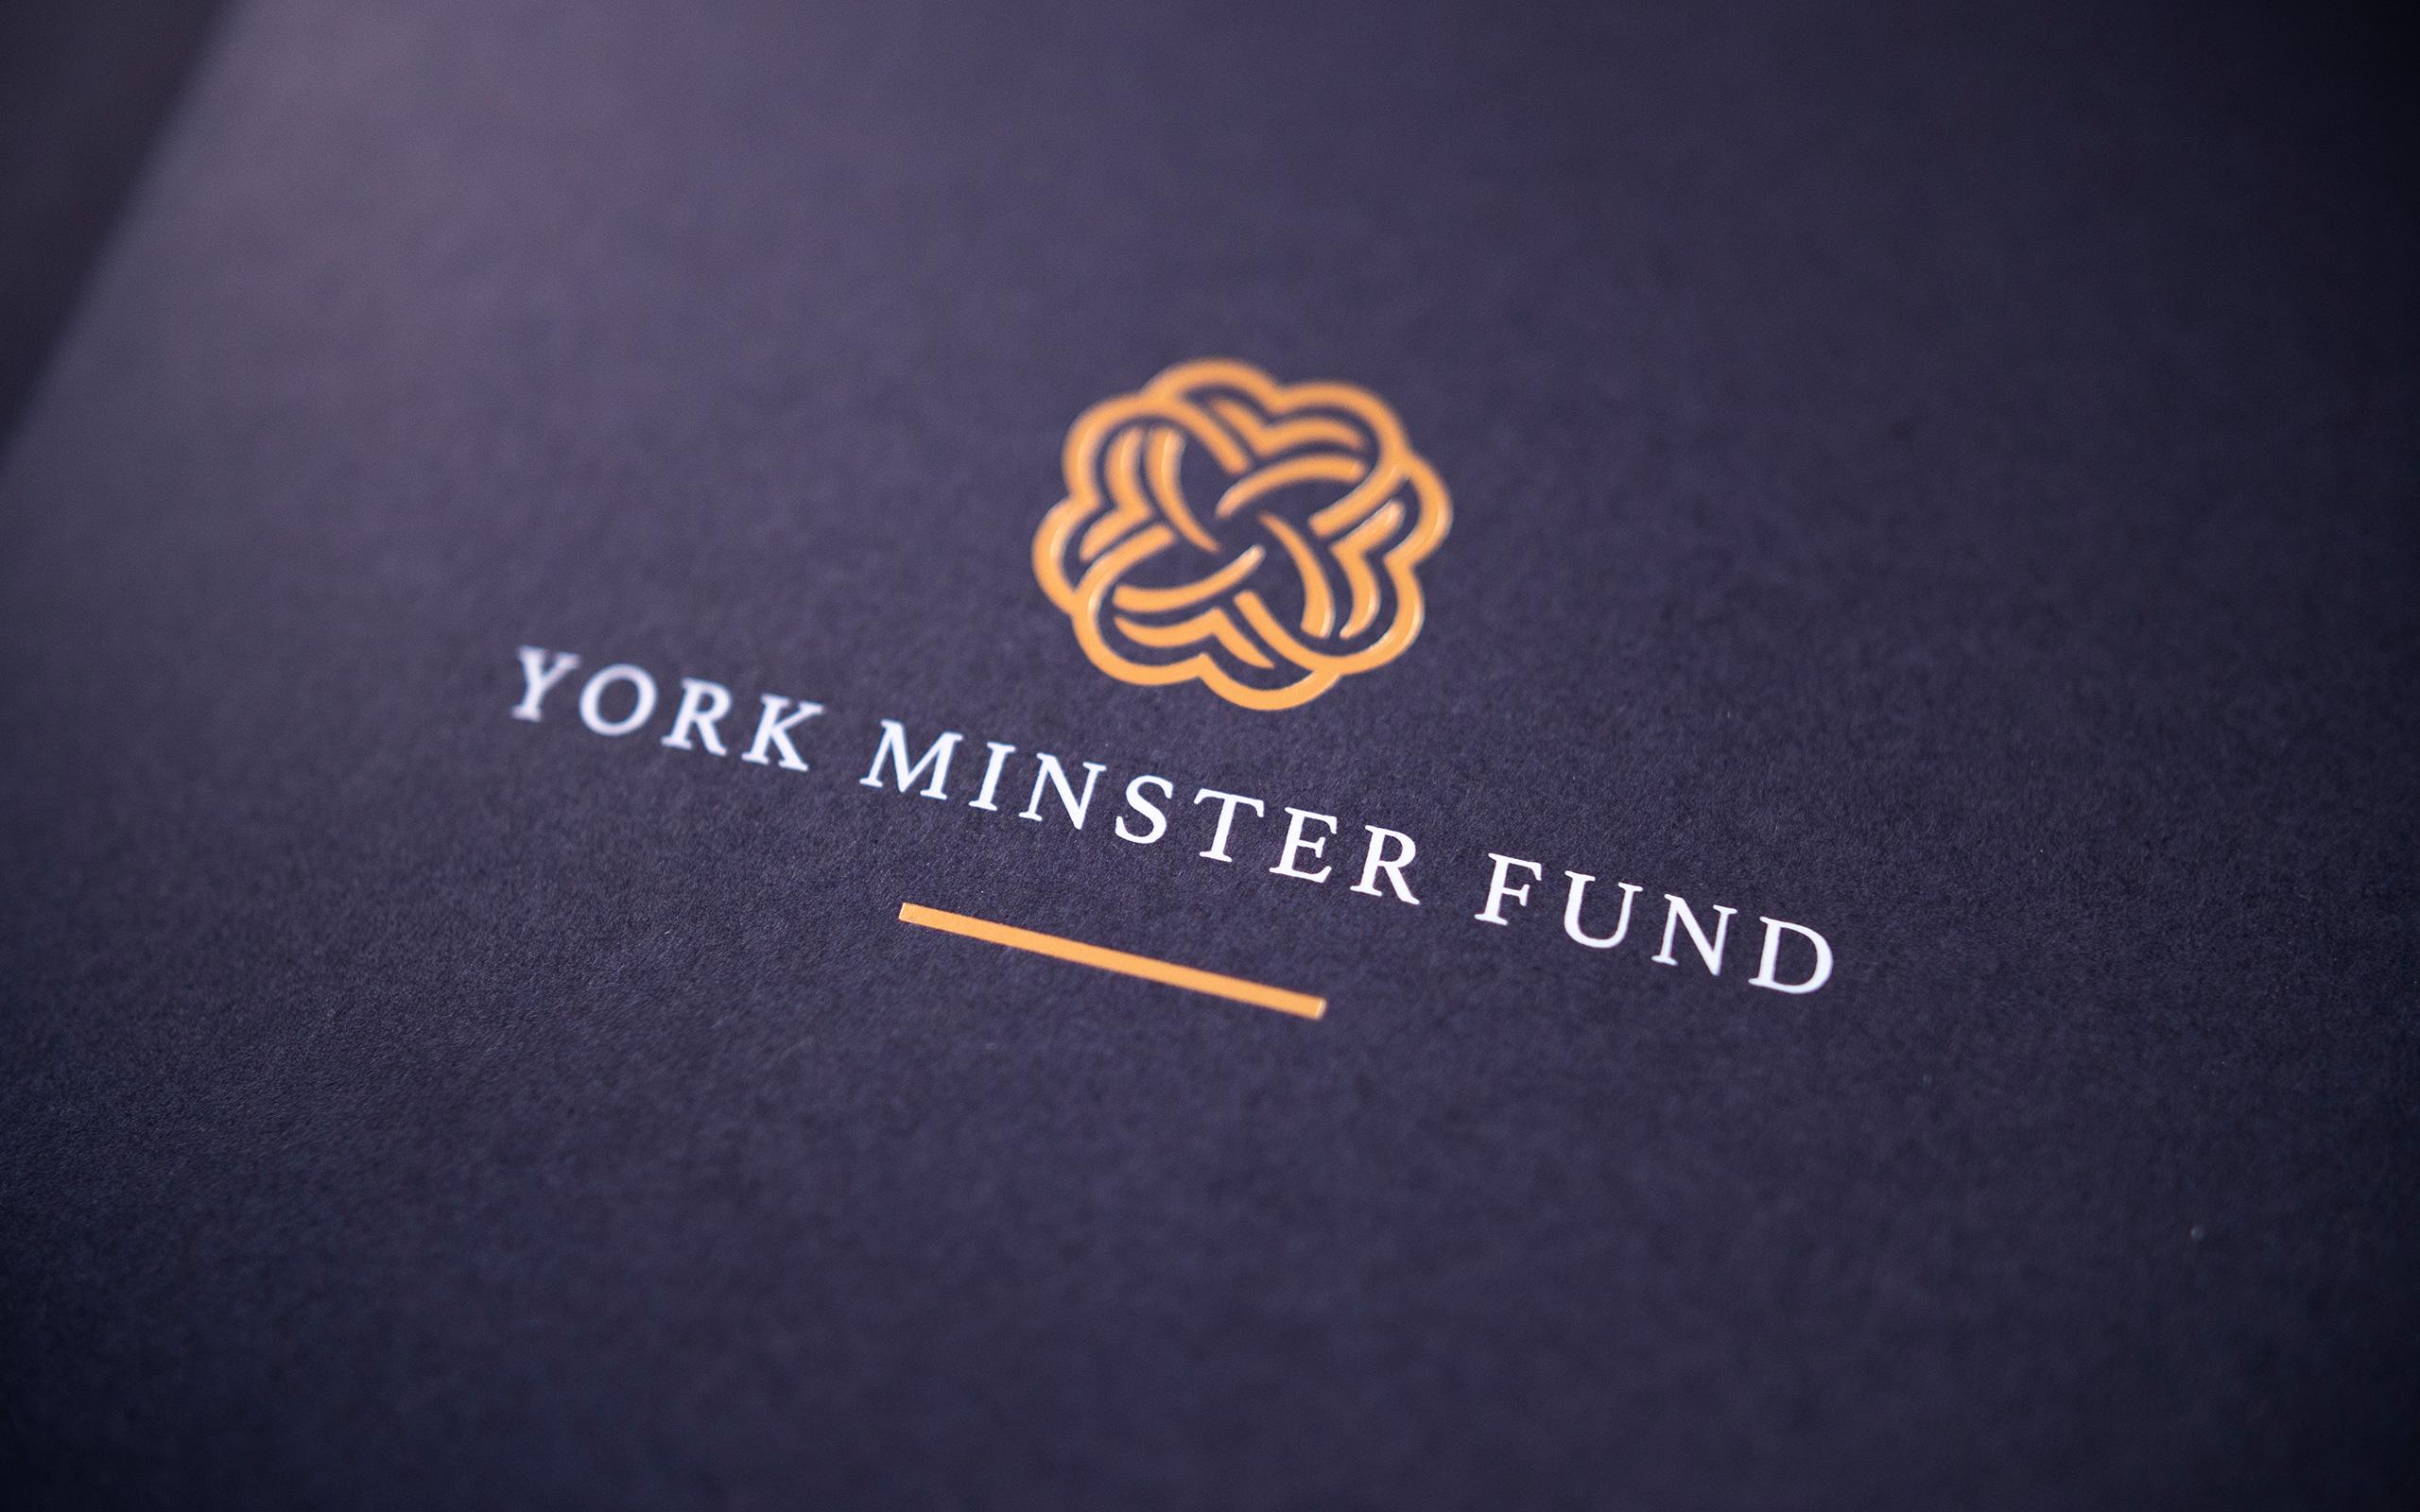 York Minster Fund Foiled Logo White Ink